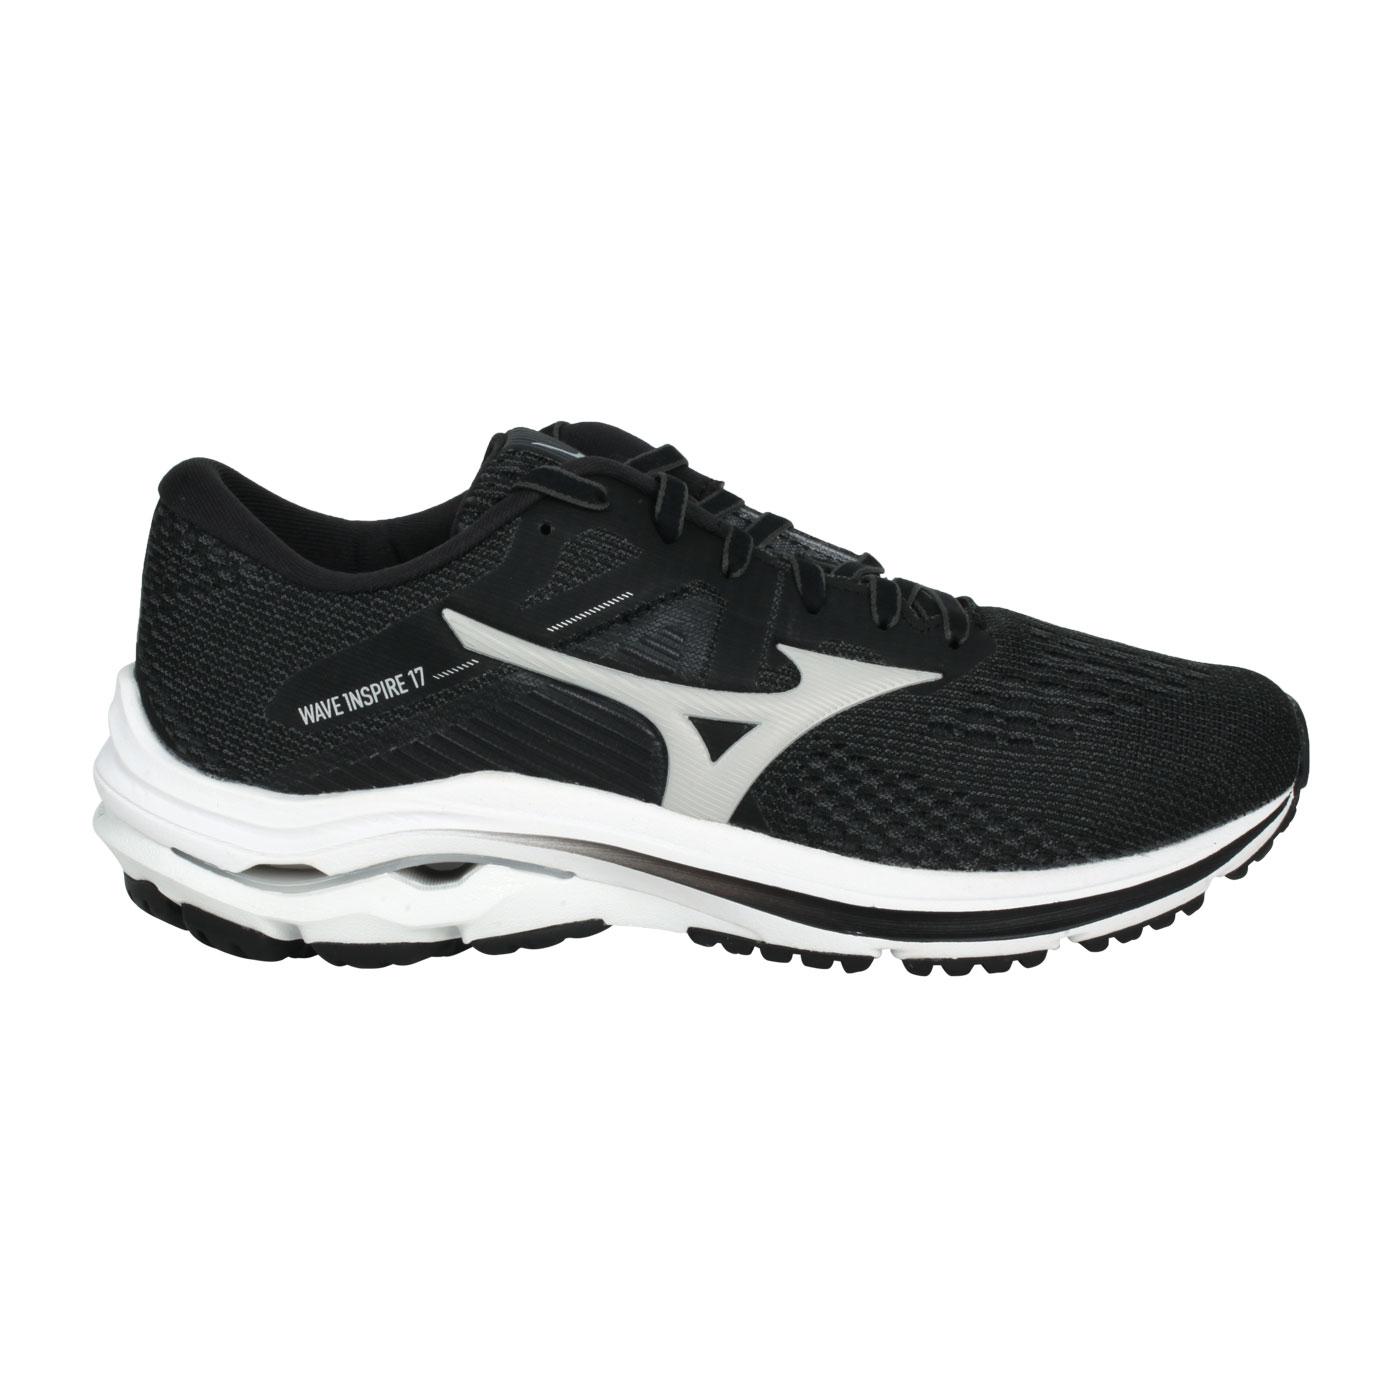 MIZUNO 女款慢跑鞋-WIDE  @WAVE INSPIRE 17 WIDE@J1GD214638 - 黑淺灰